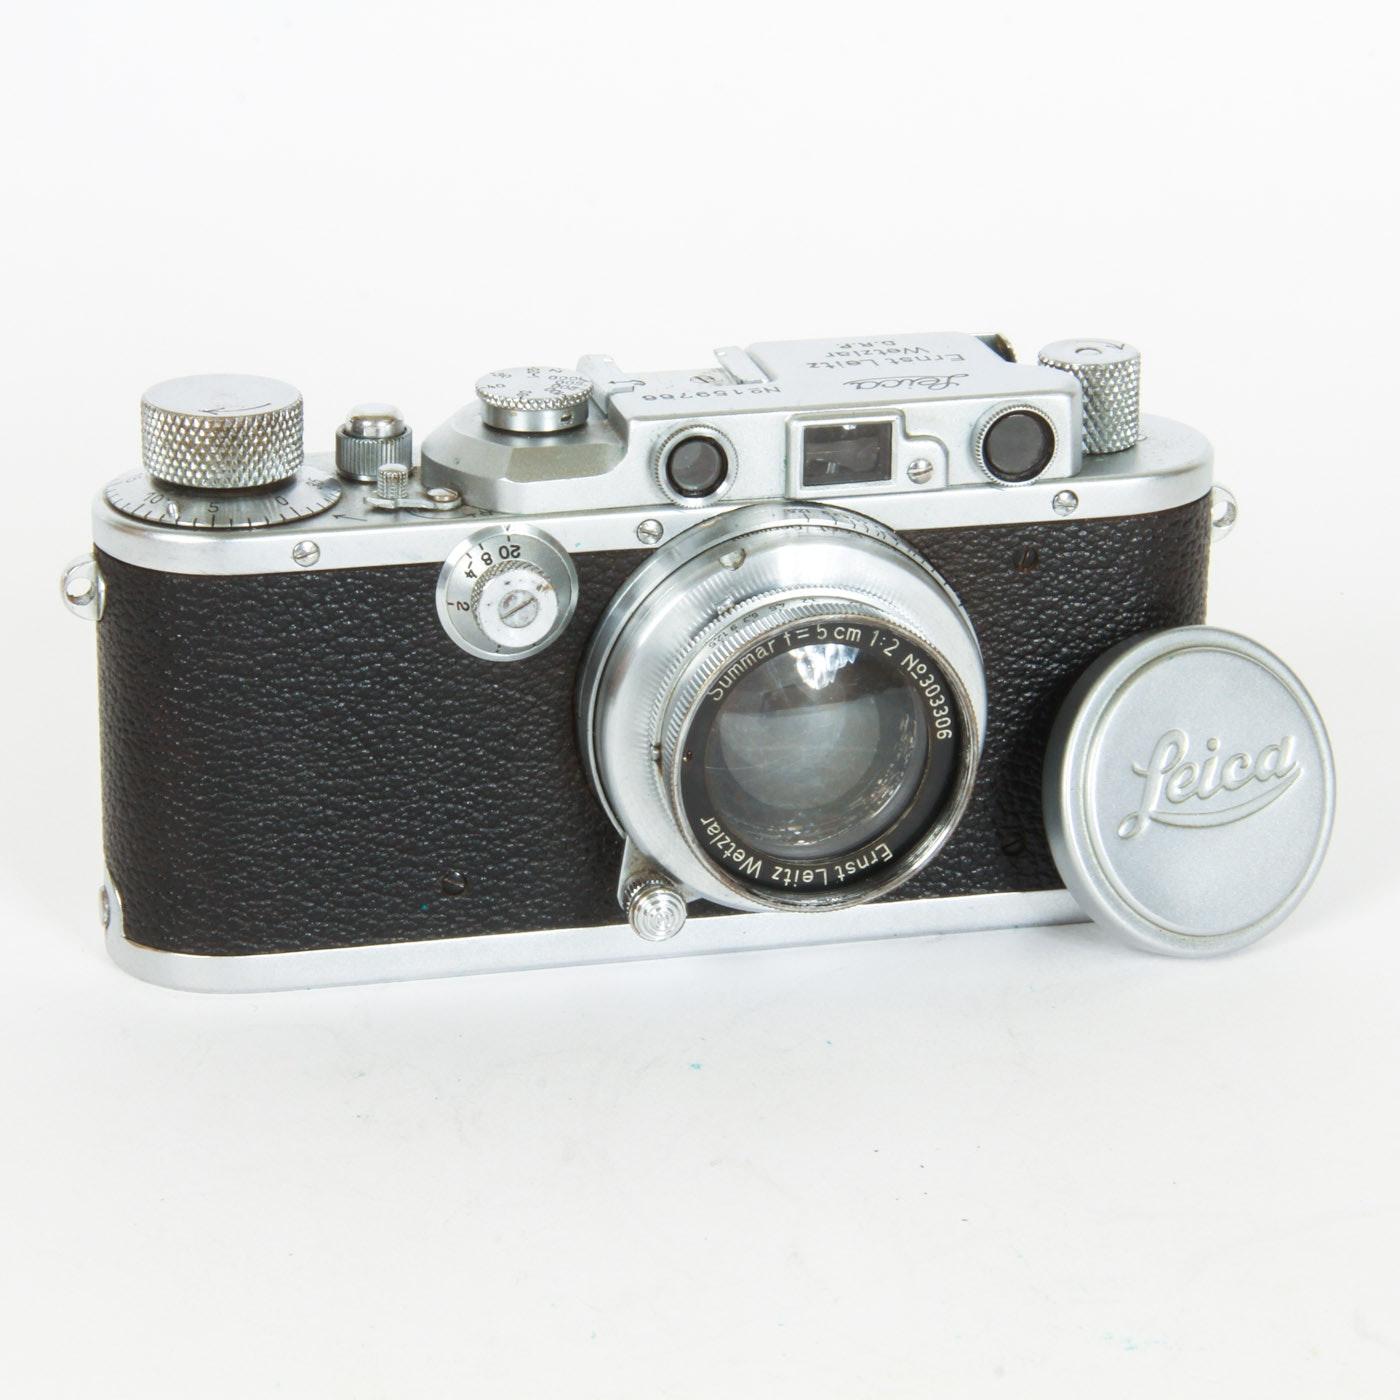 Leica D.R.P. Ernst Leitz Wetzlar Camera